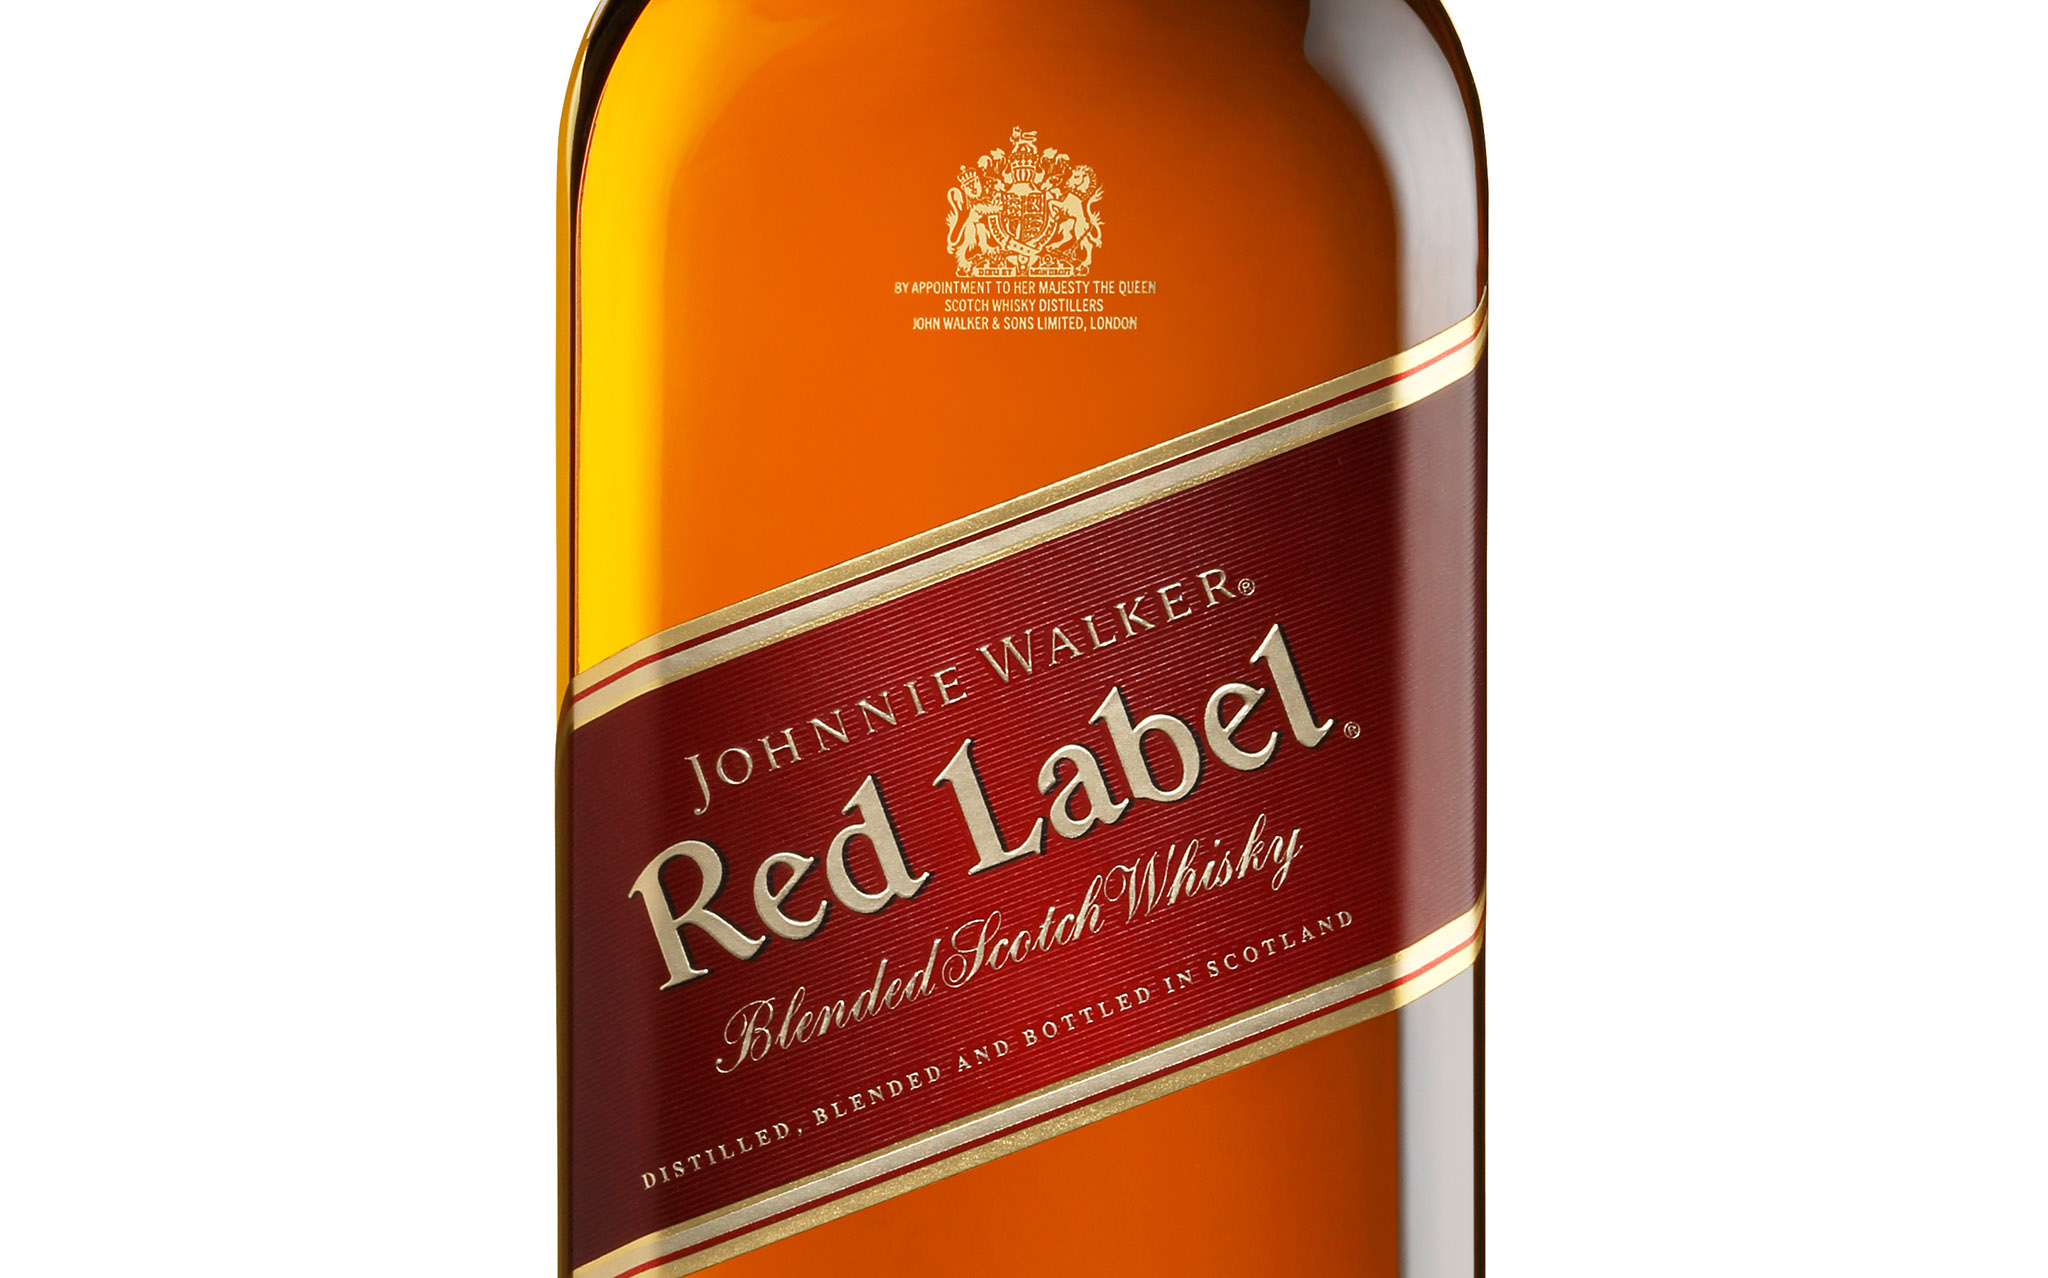 Red Label zoom 2048.jpg